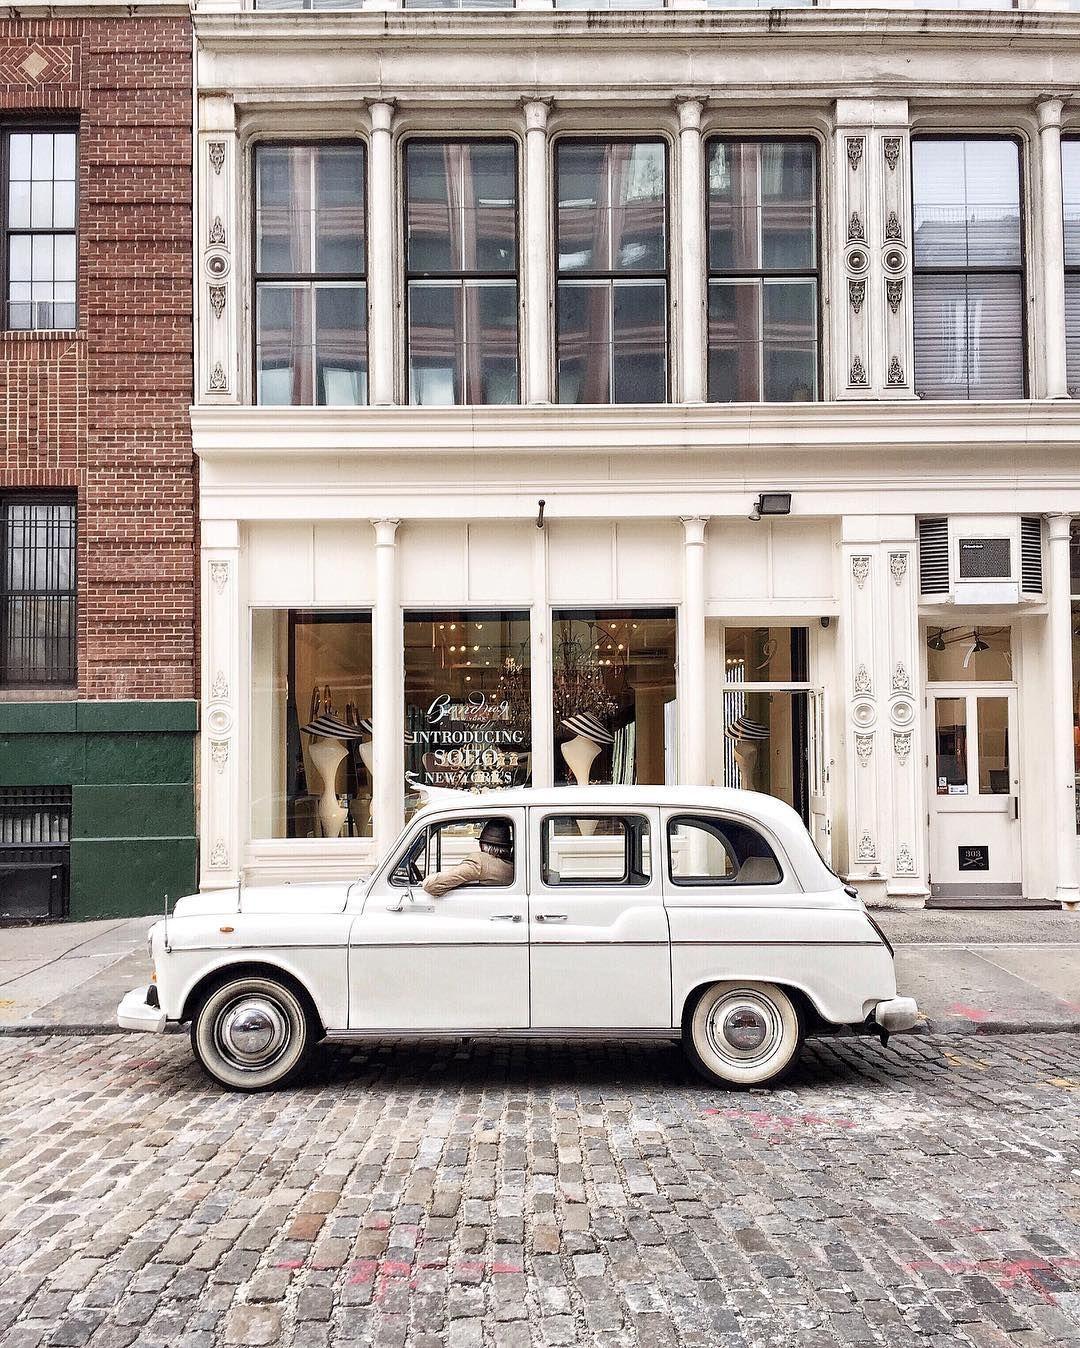 Soho, NYC | Holiday gifts, Vacation, Places